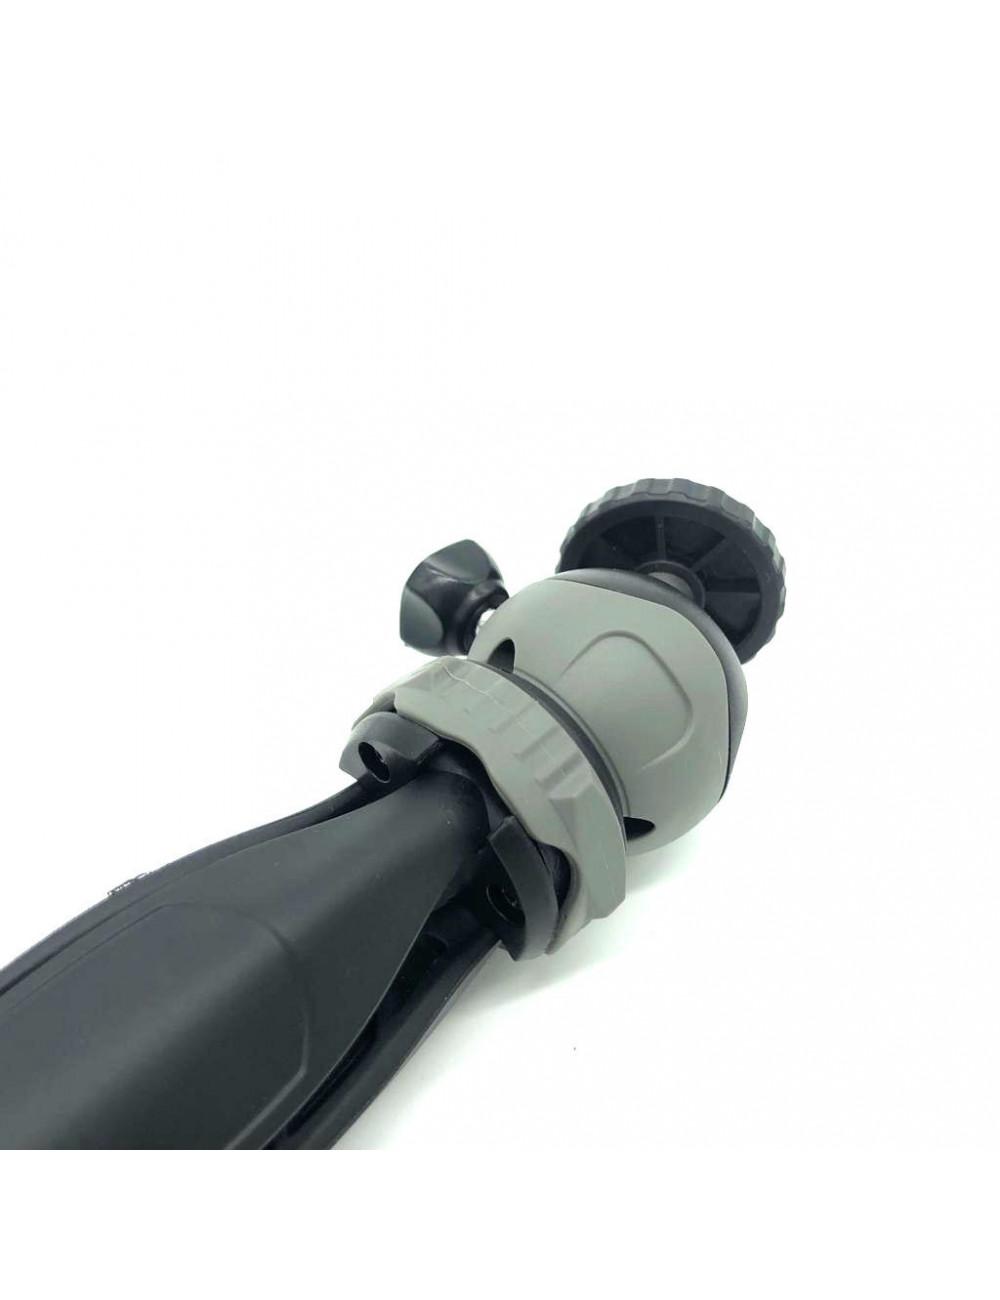 Pivot Adaptor de Rode, Accesorio para inclinar  en www.apertura.cl  Chile